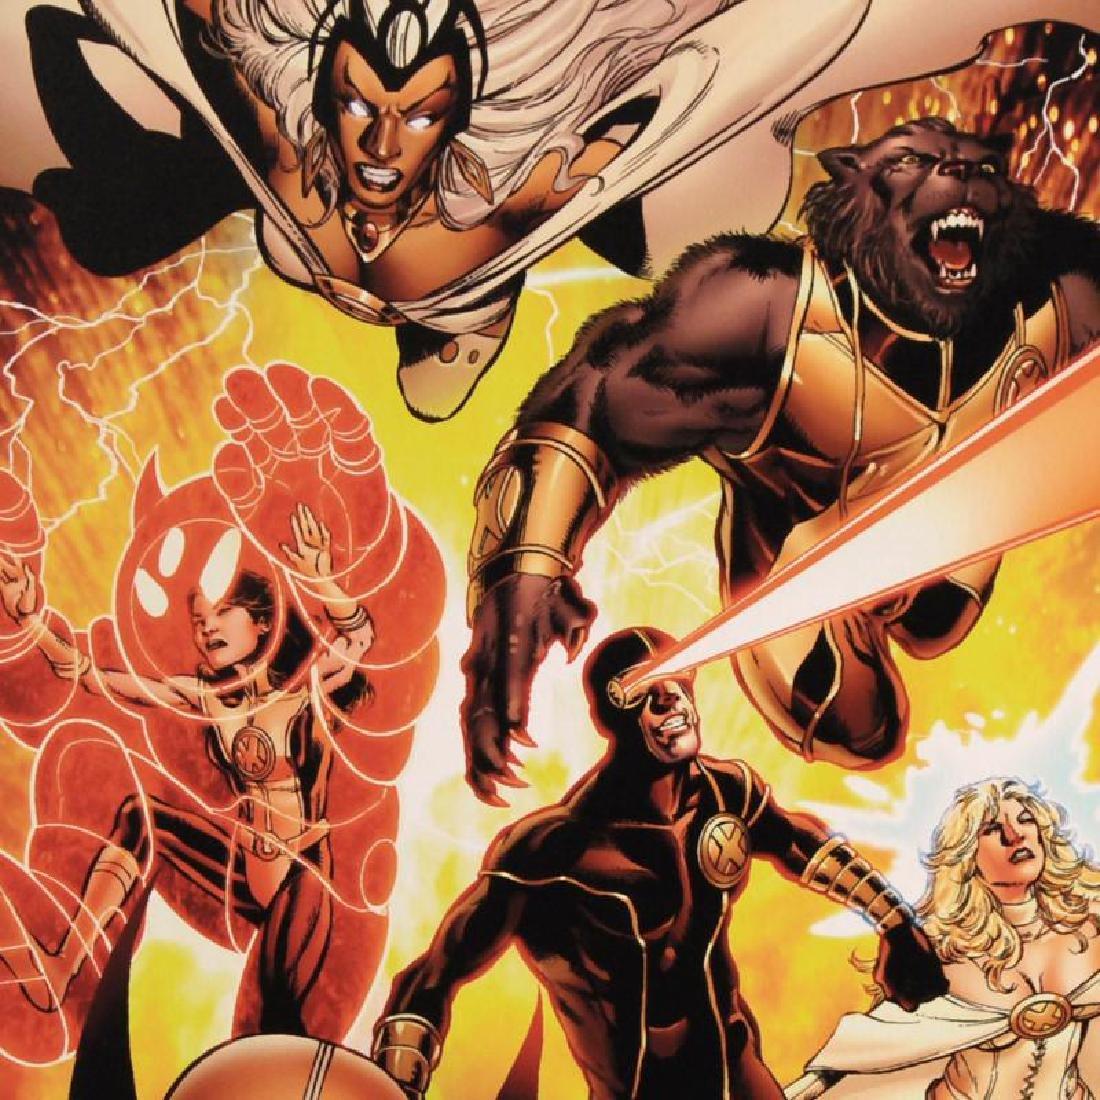 Astonishing X-Men #35 by Marvel Comics - 2